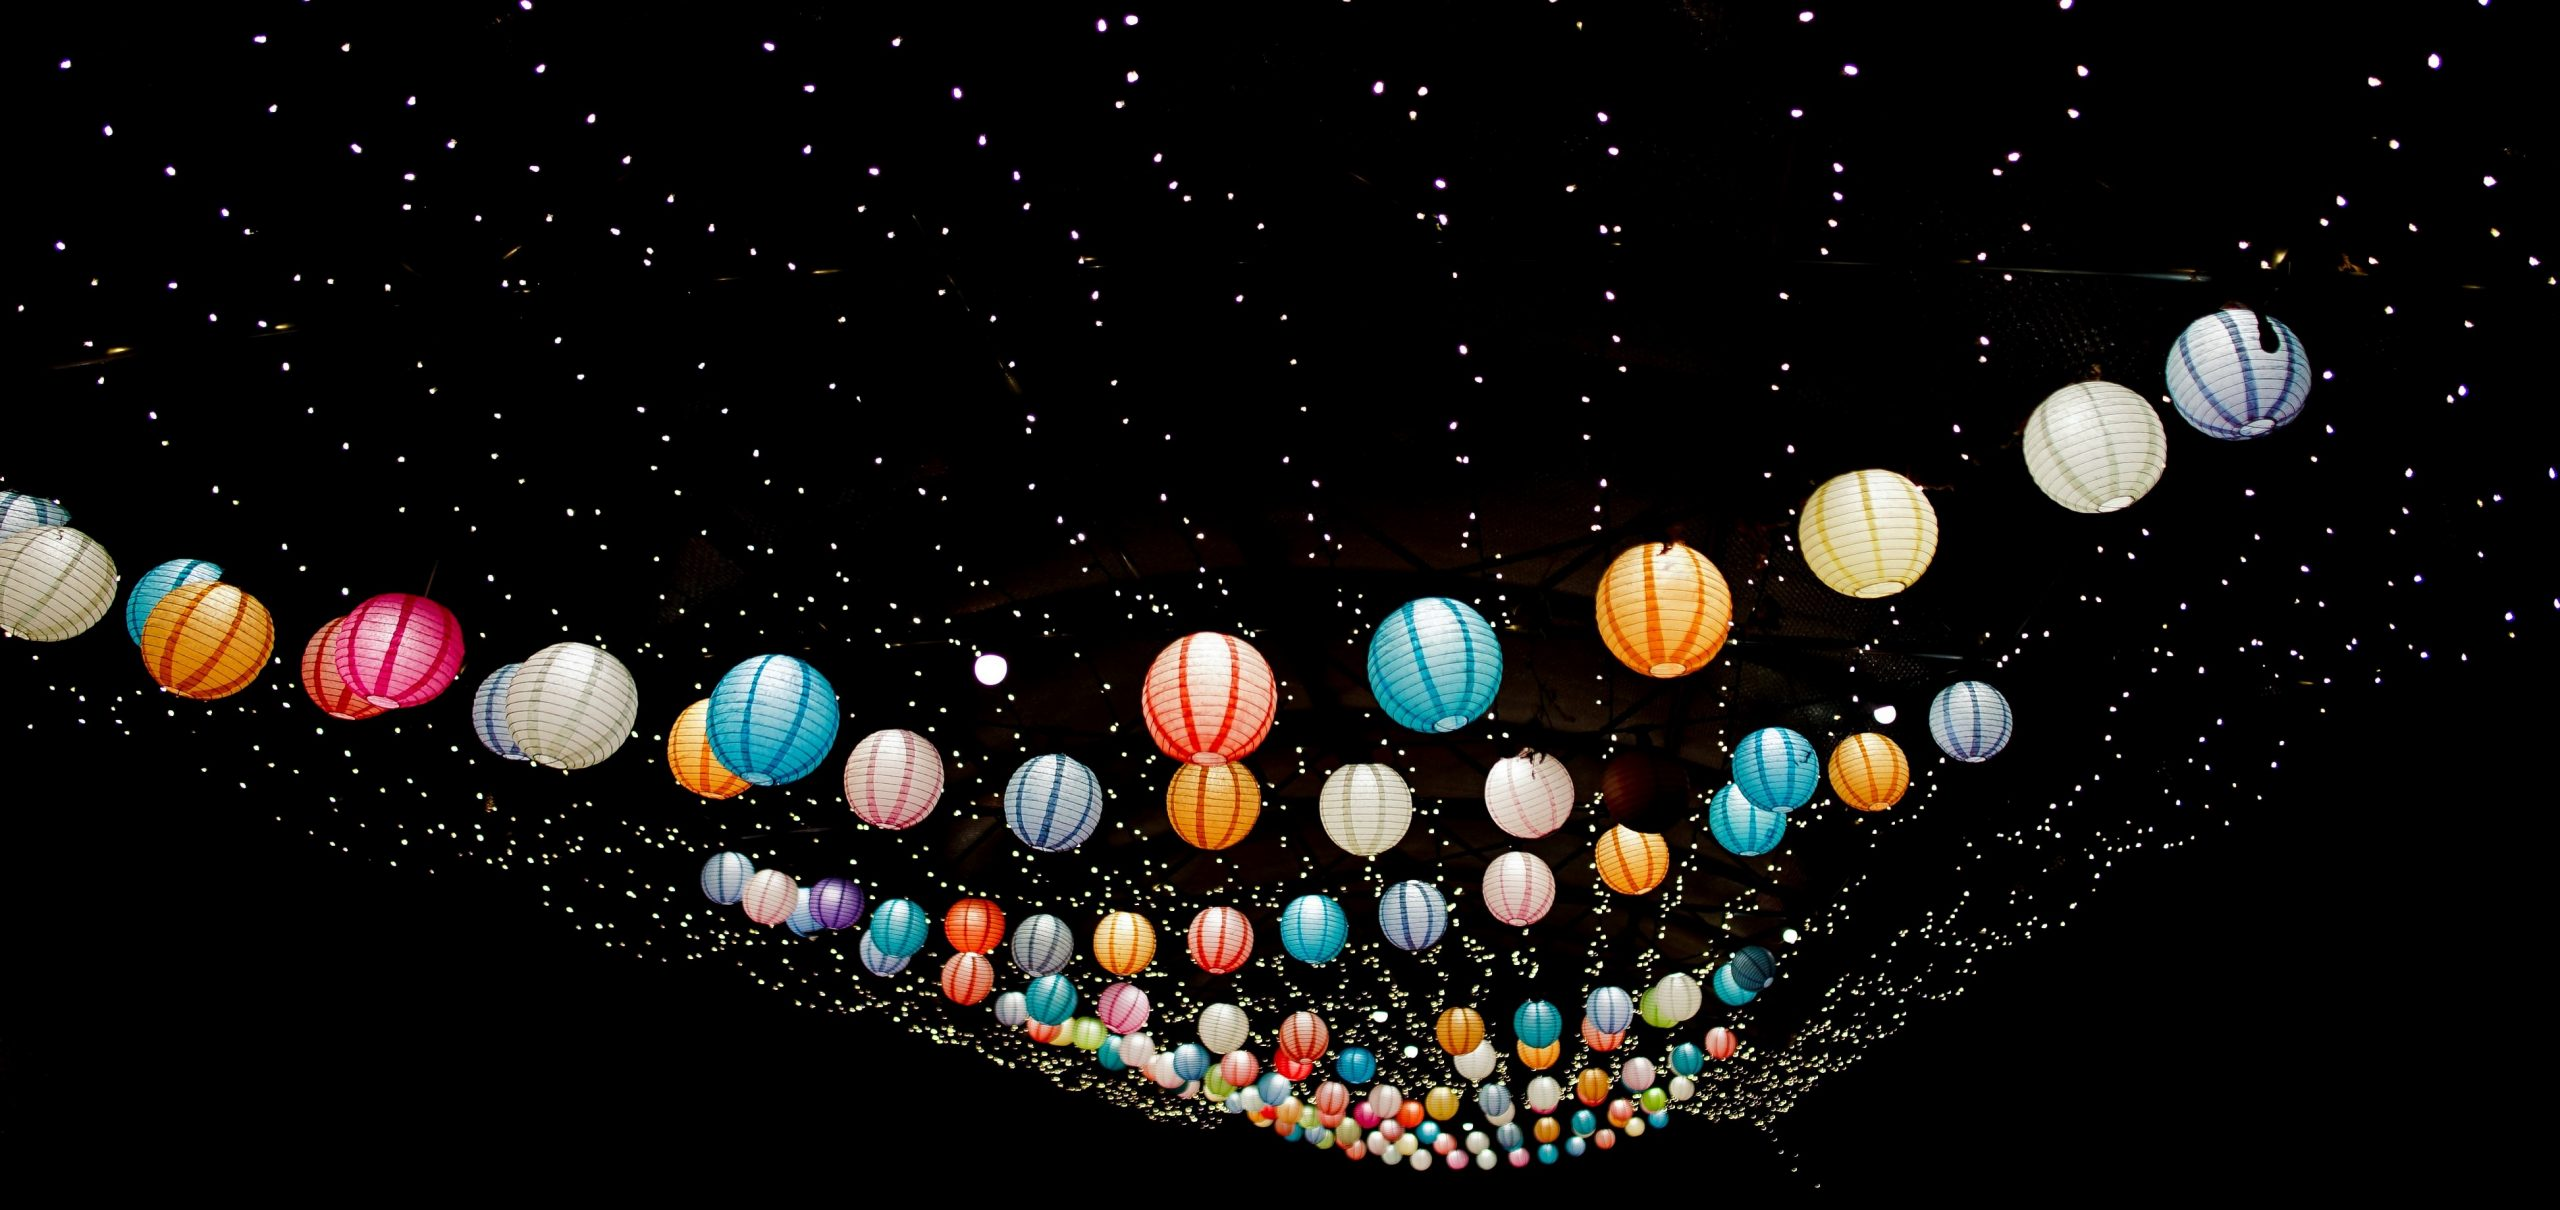 coloured lanterns in a dark sky